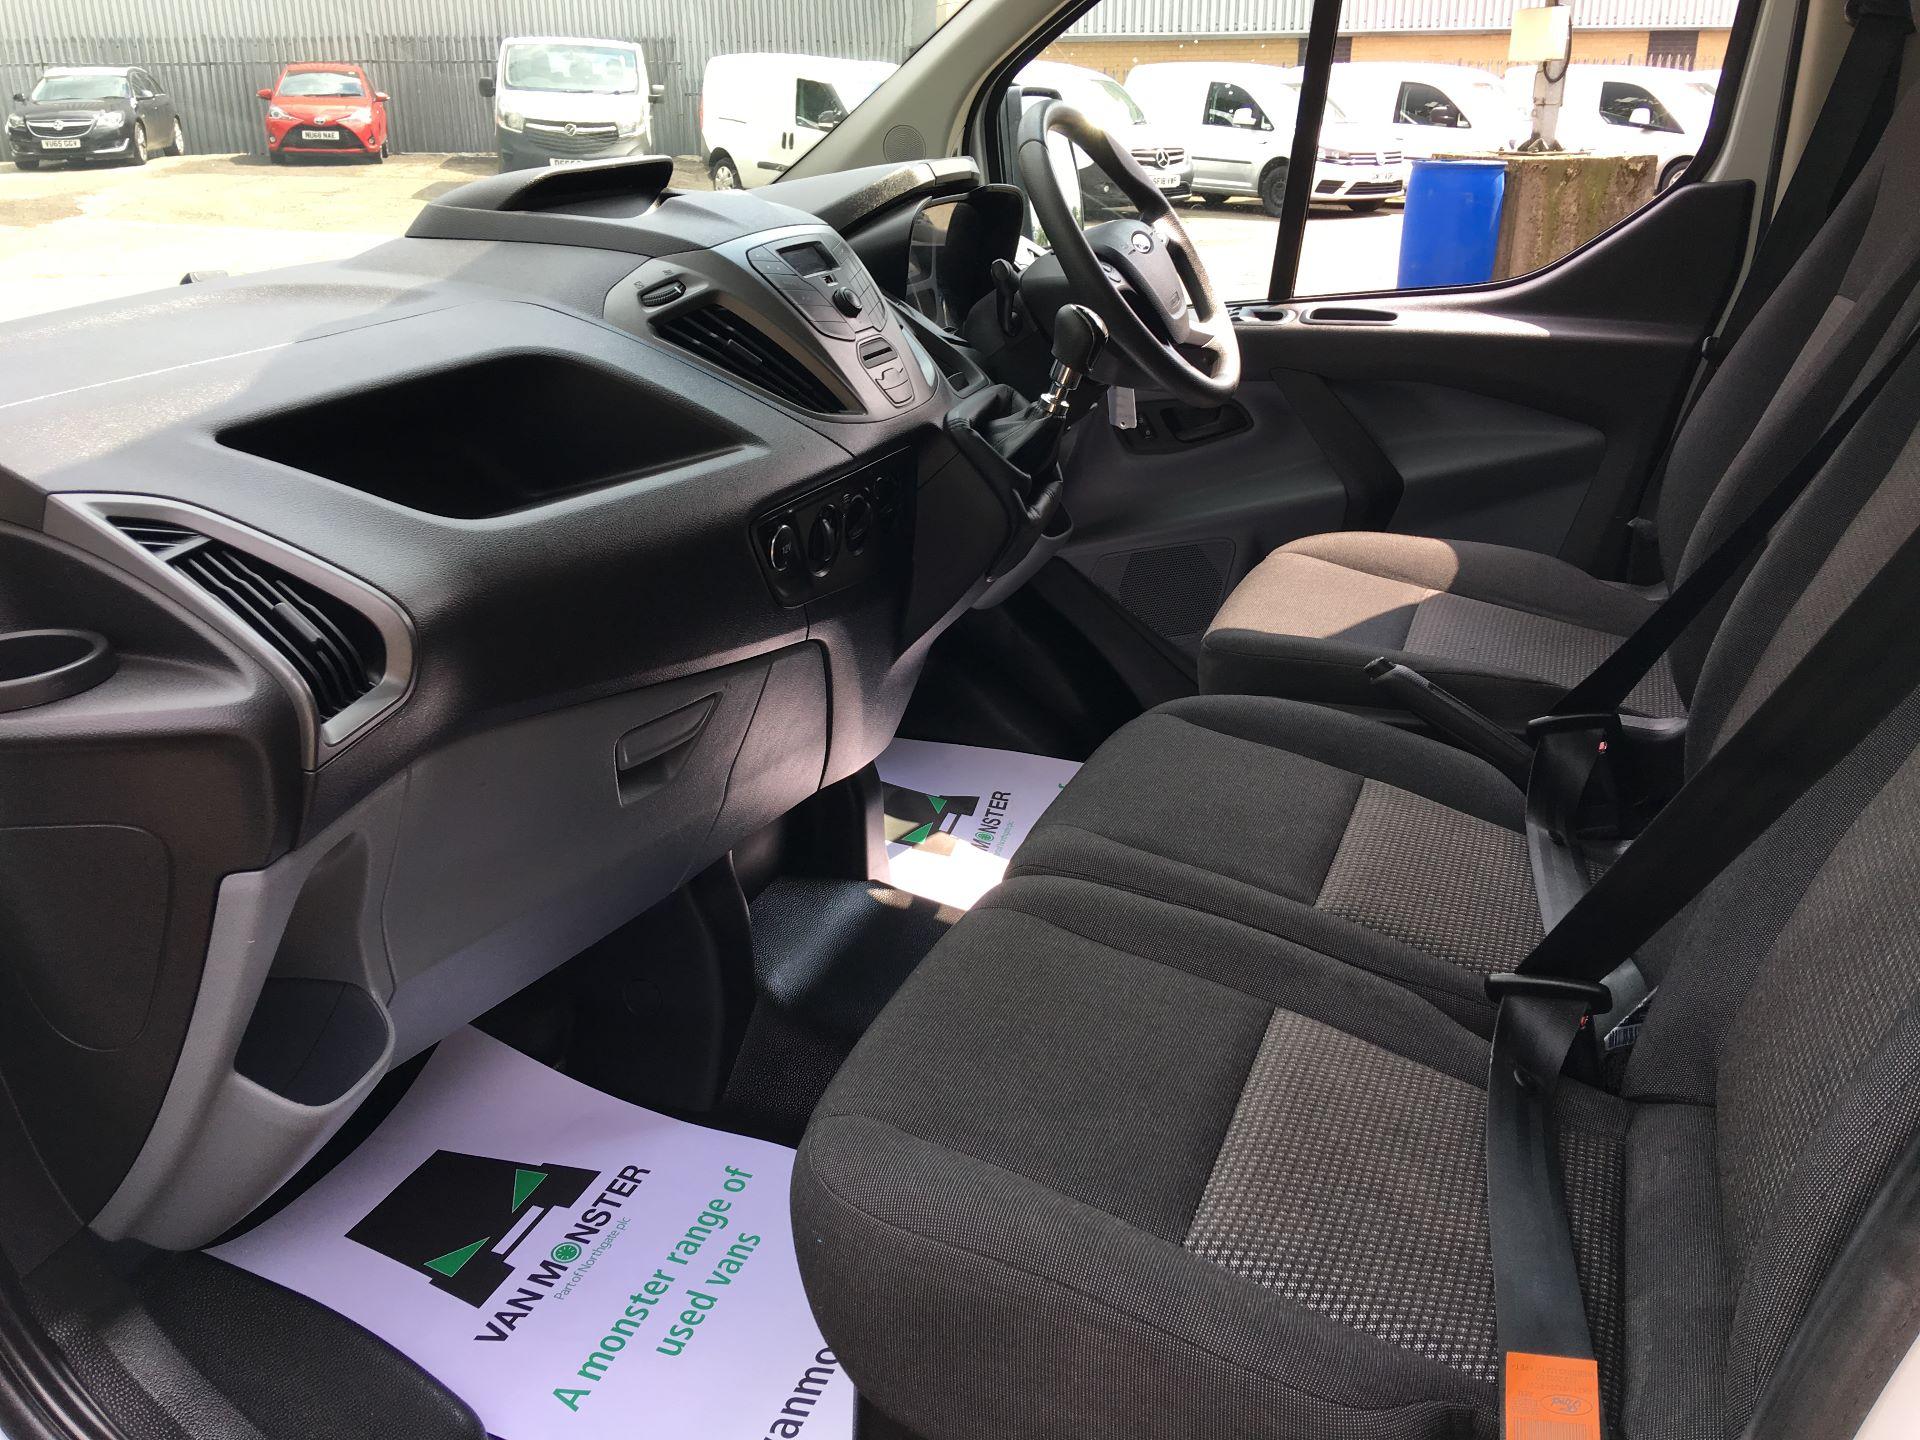 2018 Ford Transit Custom 270 L1 DIESEL FWD 2.0 TDCI 105PS LOW ROOF VAN EURO 6 (CP67NJY) Image 13